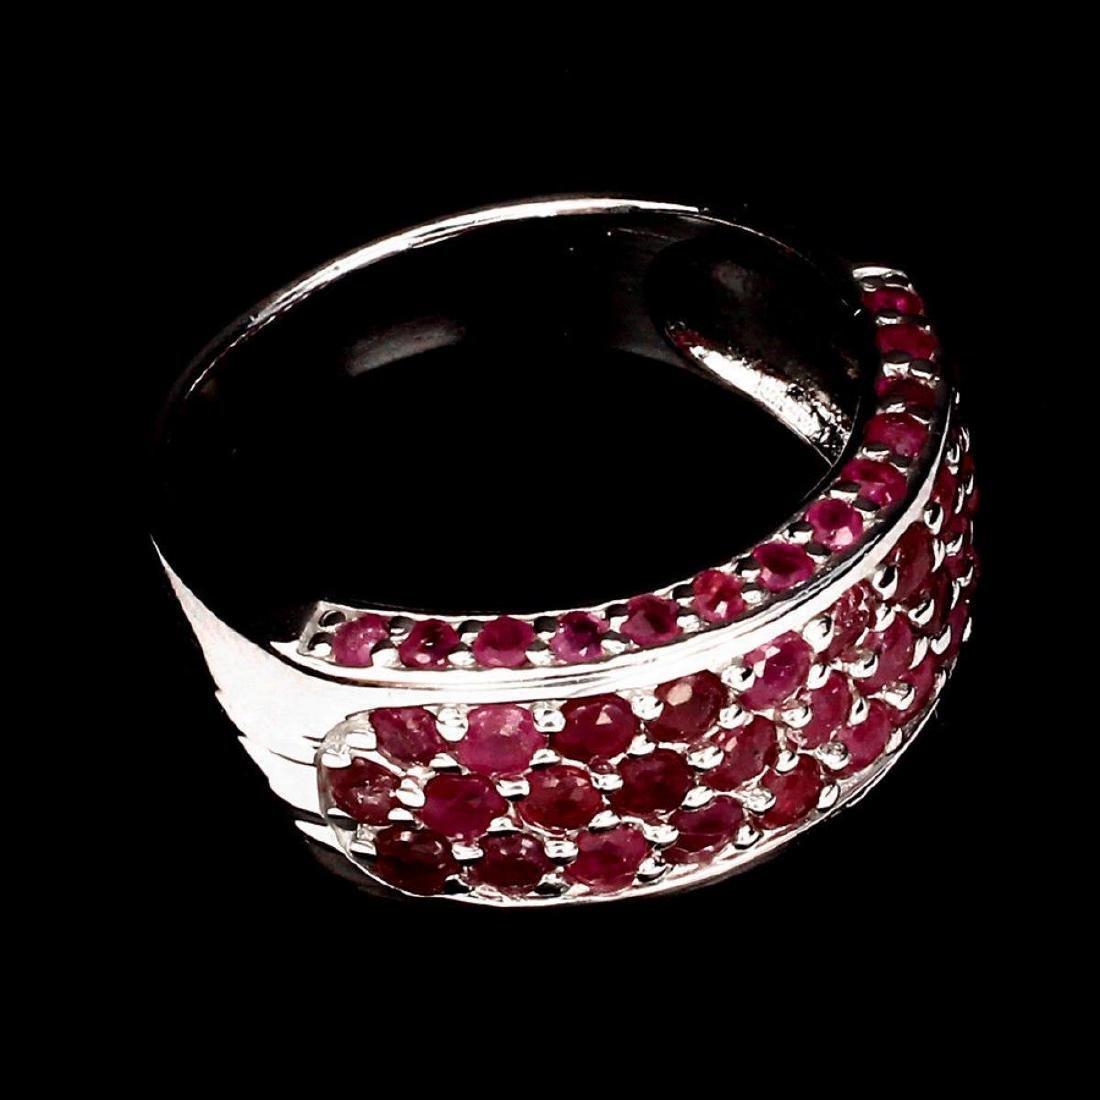 Natural Stunning 31.74 Carat Ruby Ring - 3